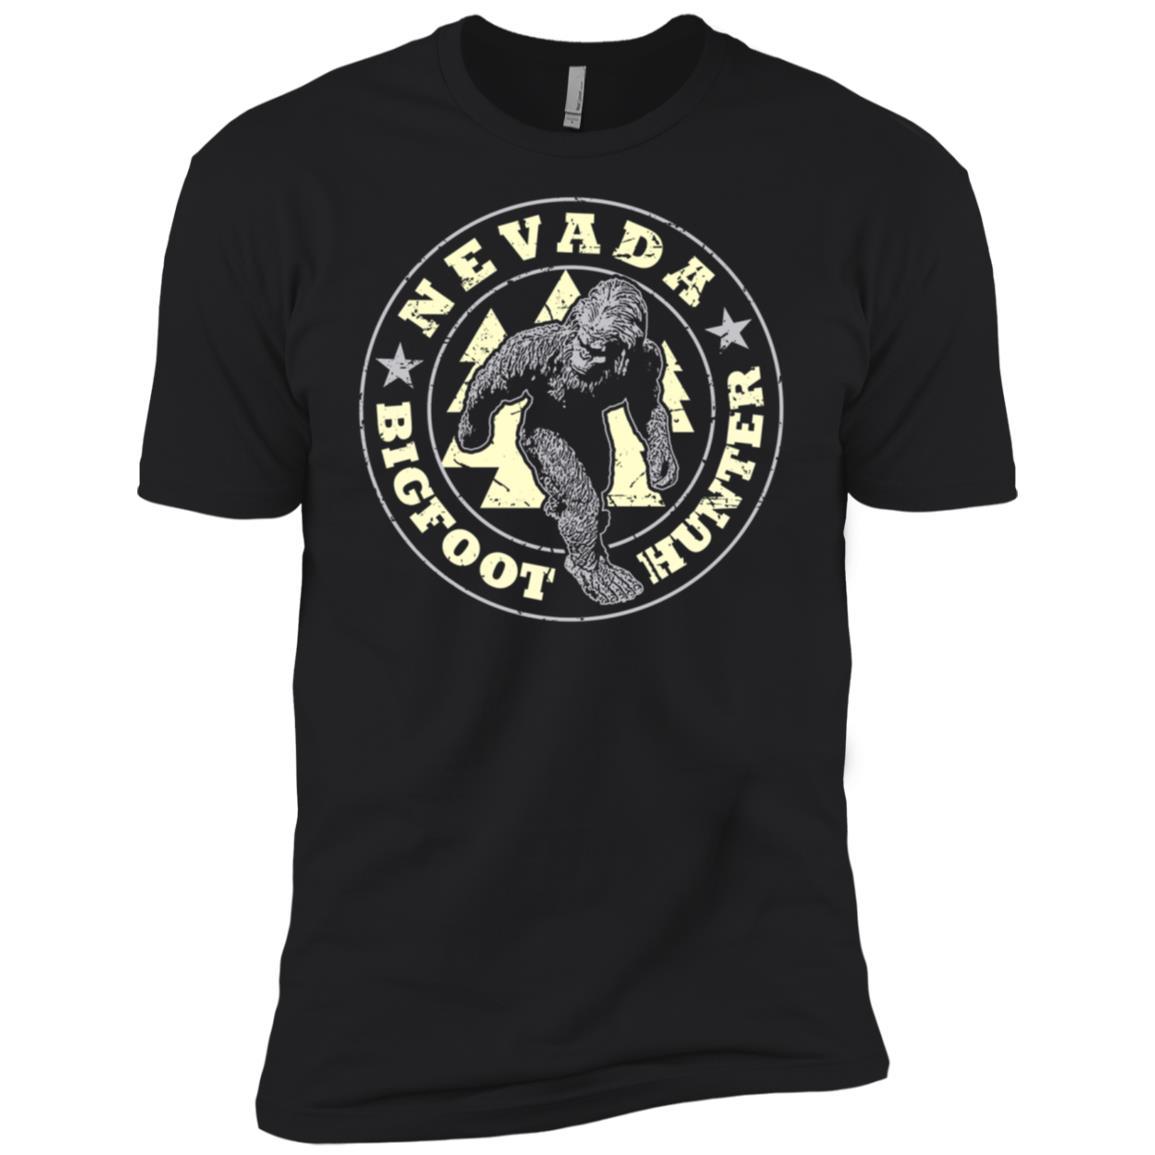 Nevada Bigfoot Hunter Believe -1 Men Short Sleeve T-Shirt